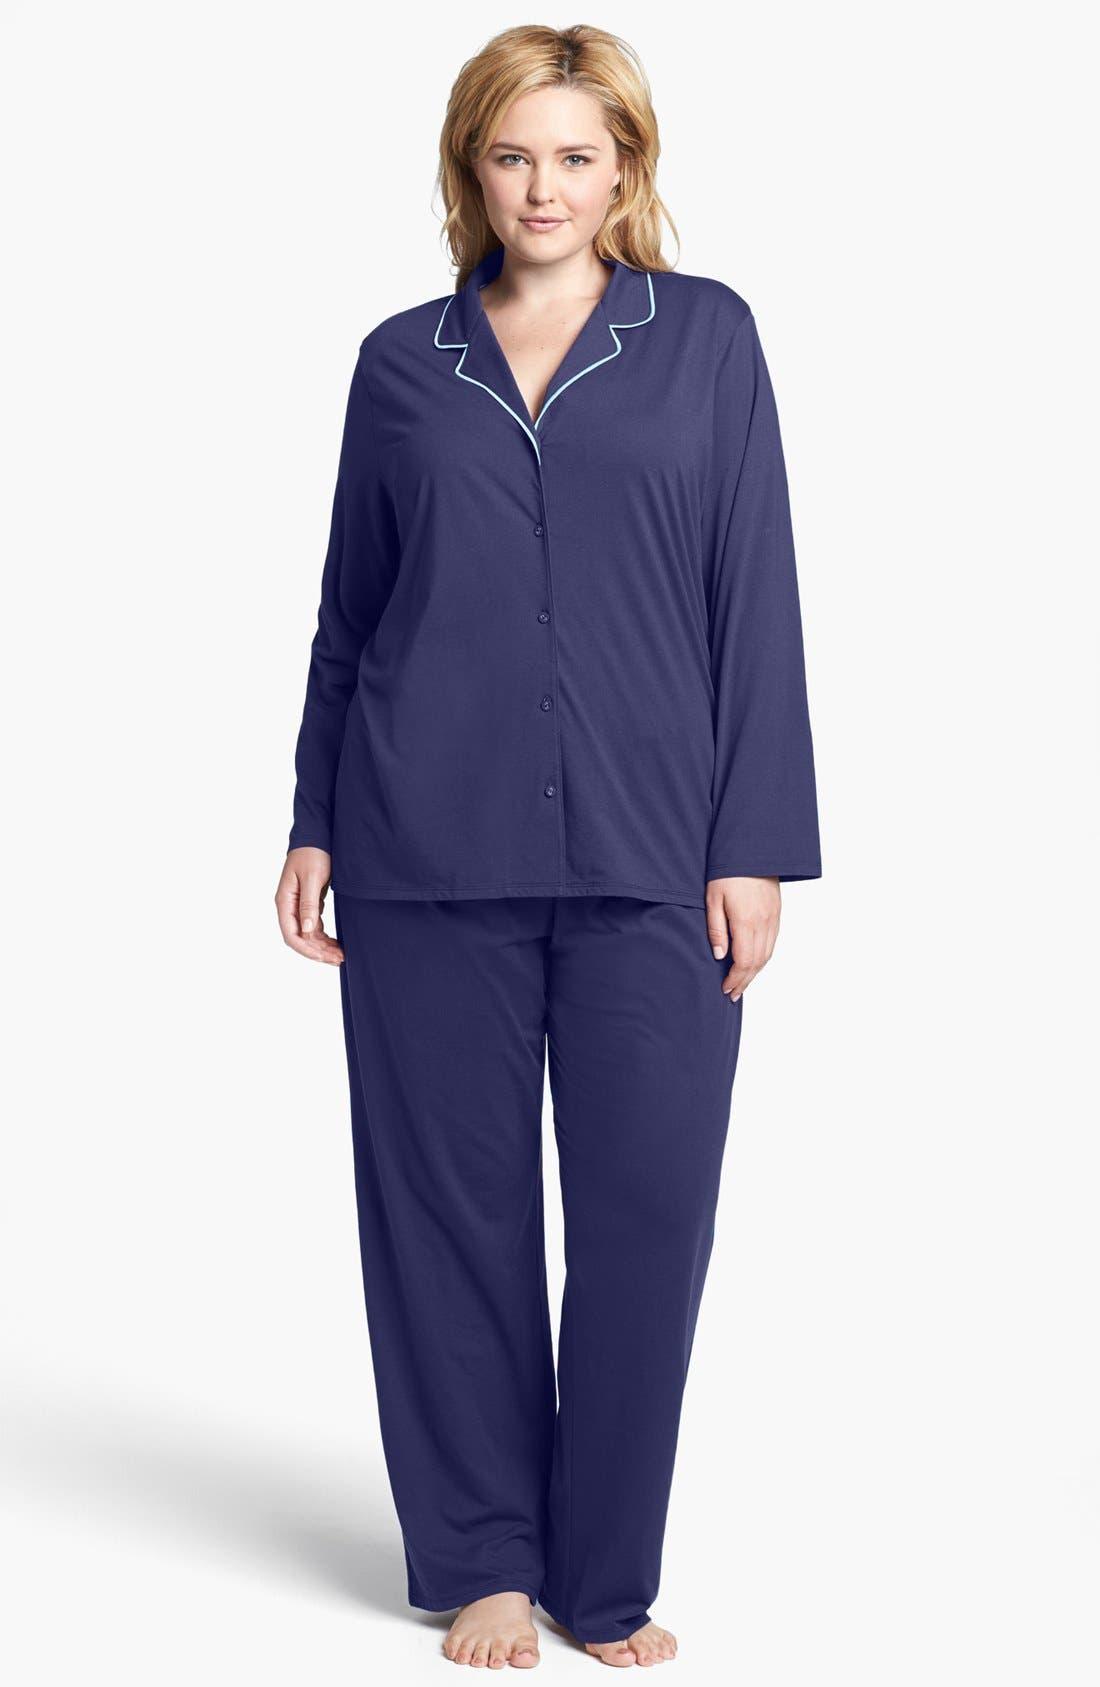 Alternate Image 1 Selected - Nordstrom 'Effortless' Pajamas (Plus Size)